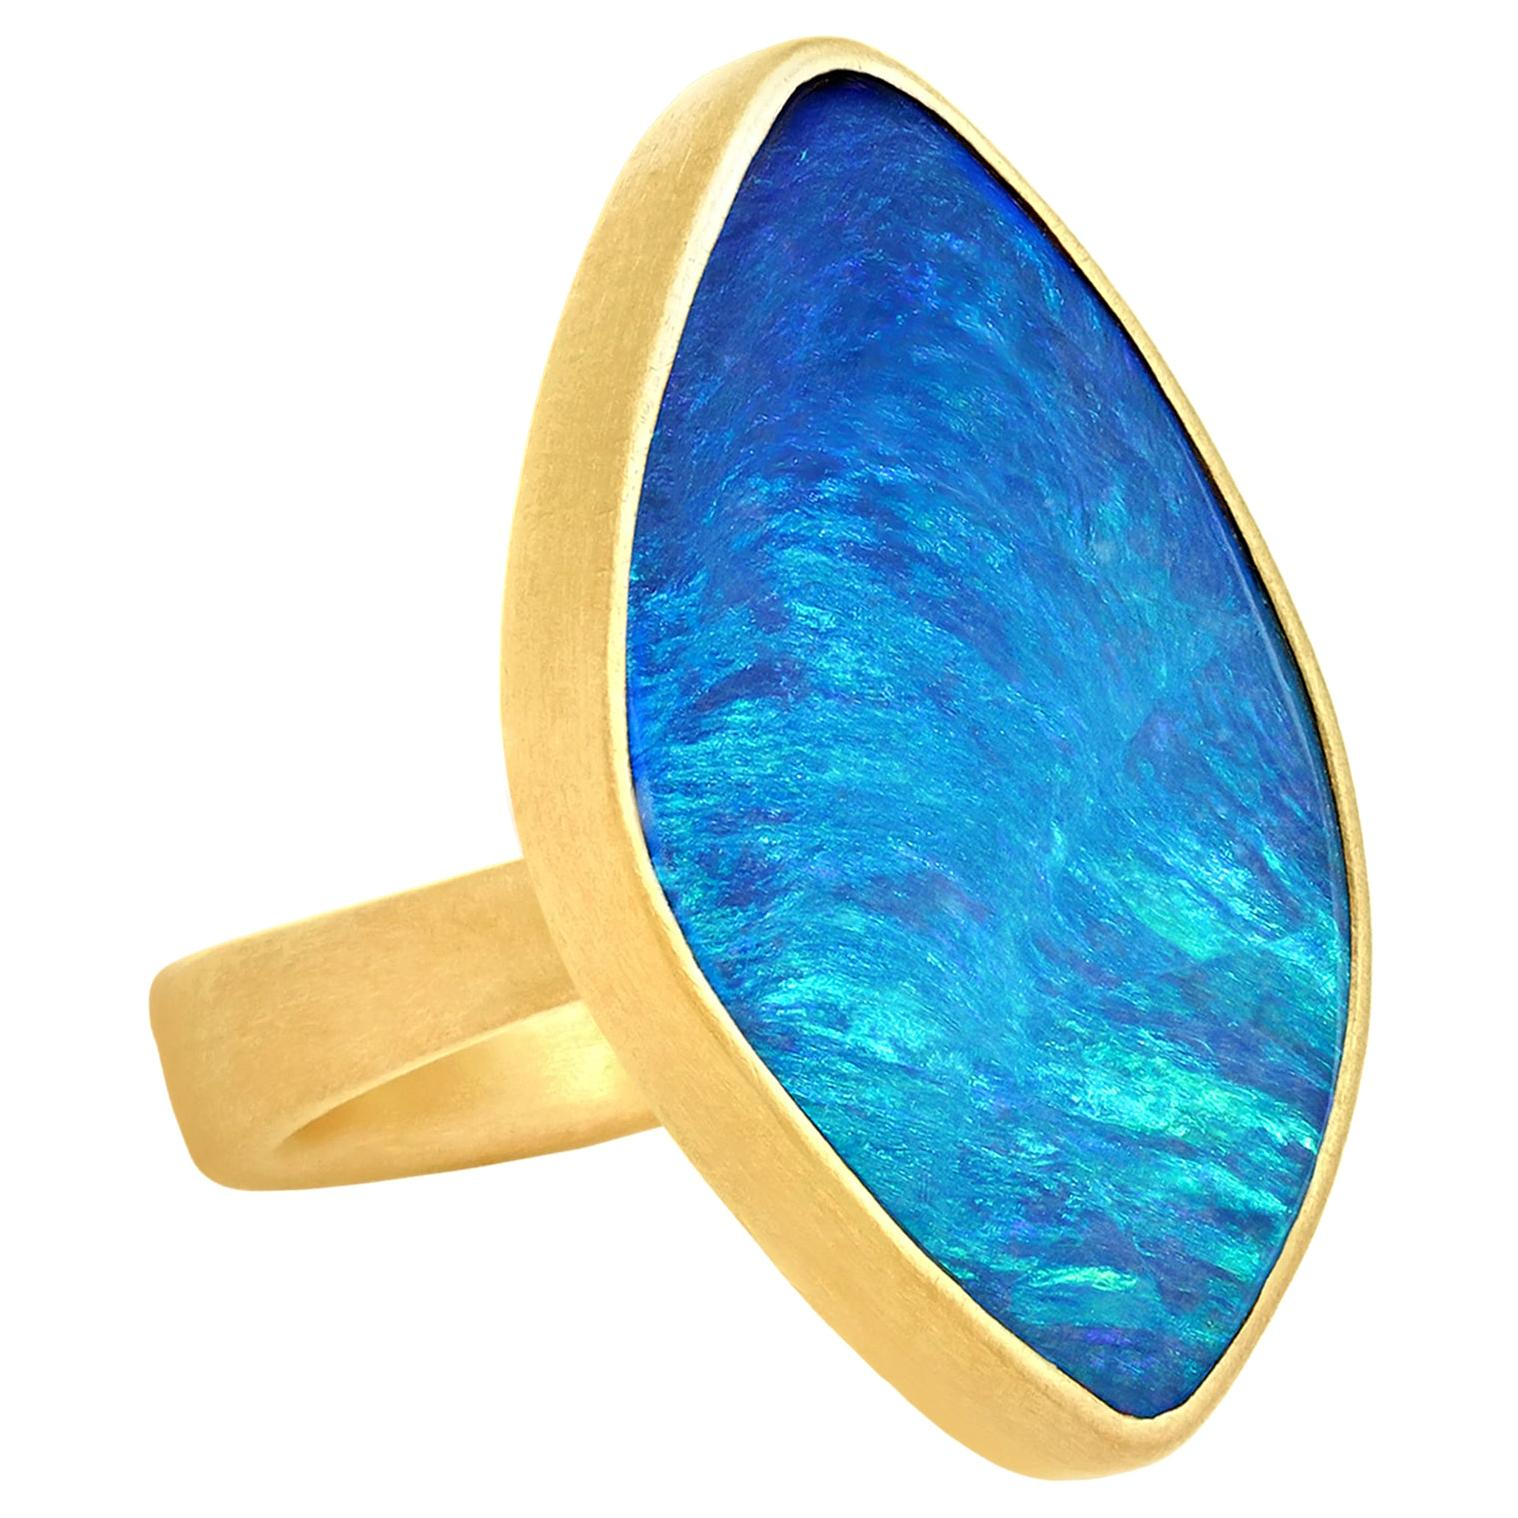 Lola Brooks Brilliant Blue Australian Opal One of a Kind 22 Karat Gold Ring